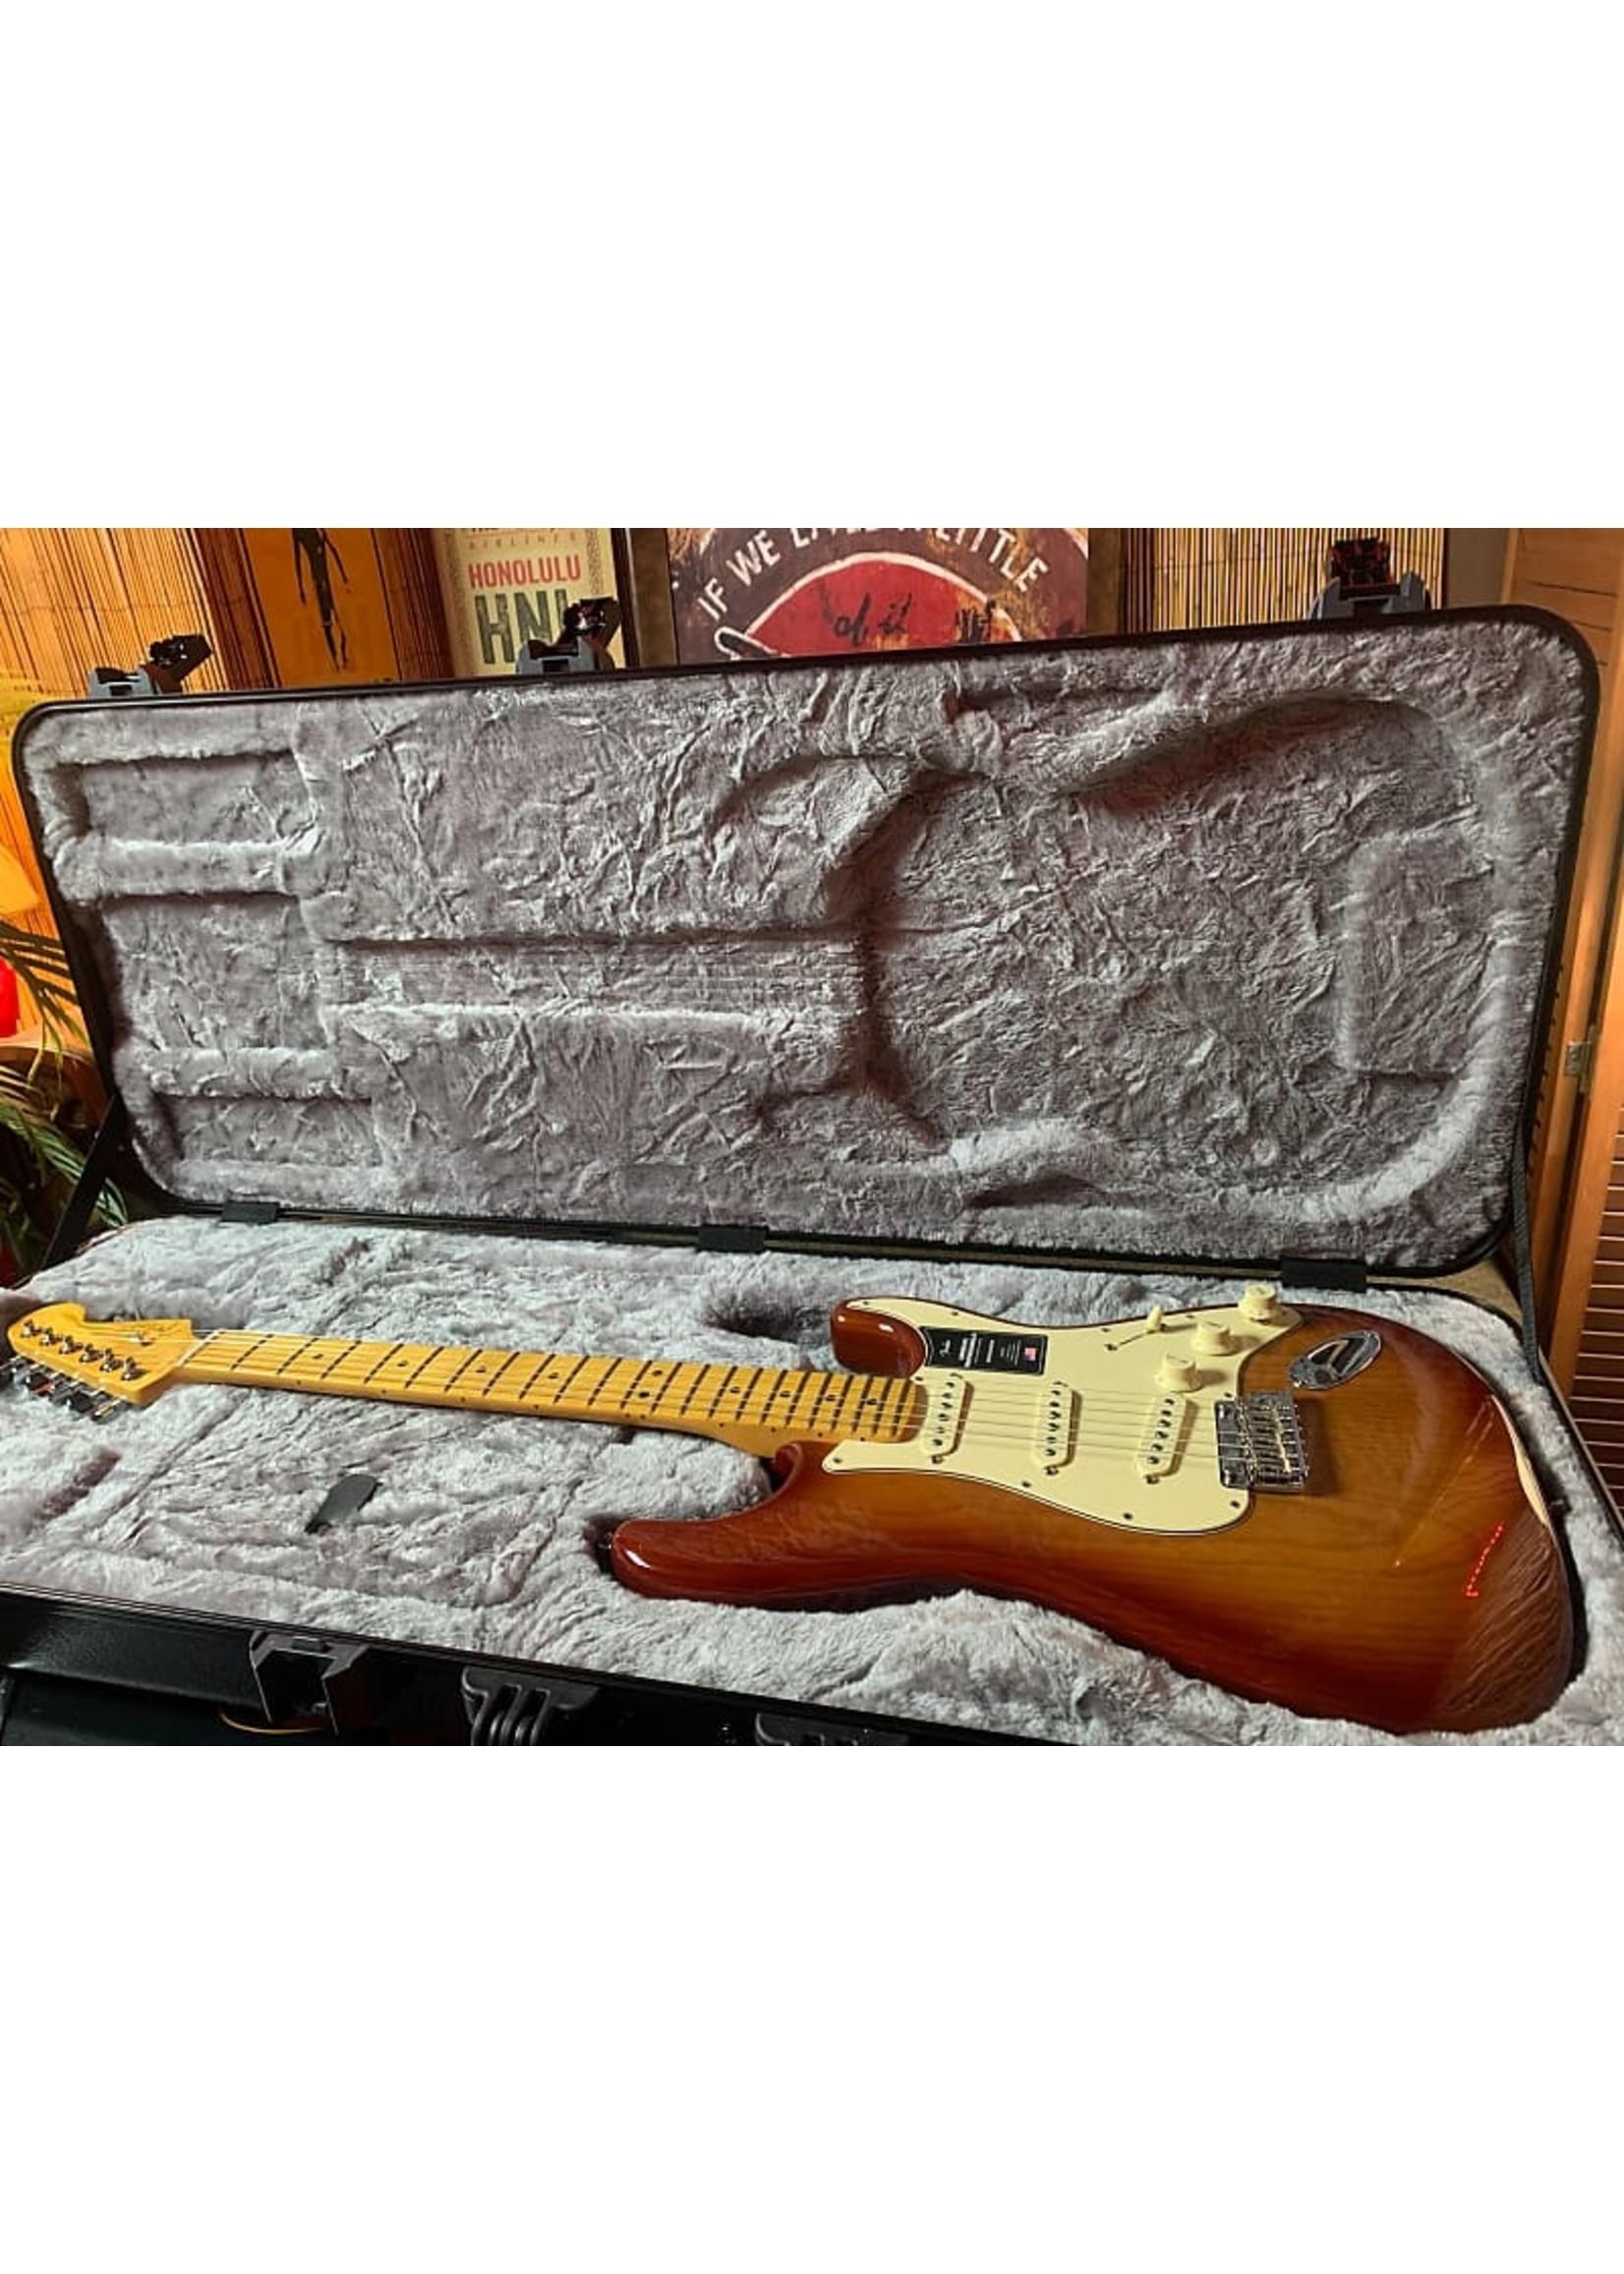 Fender Fender American Professional II Stratocaster in Sienna Sunburst